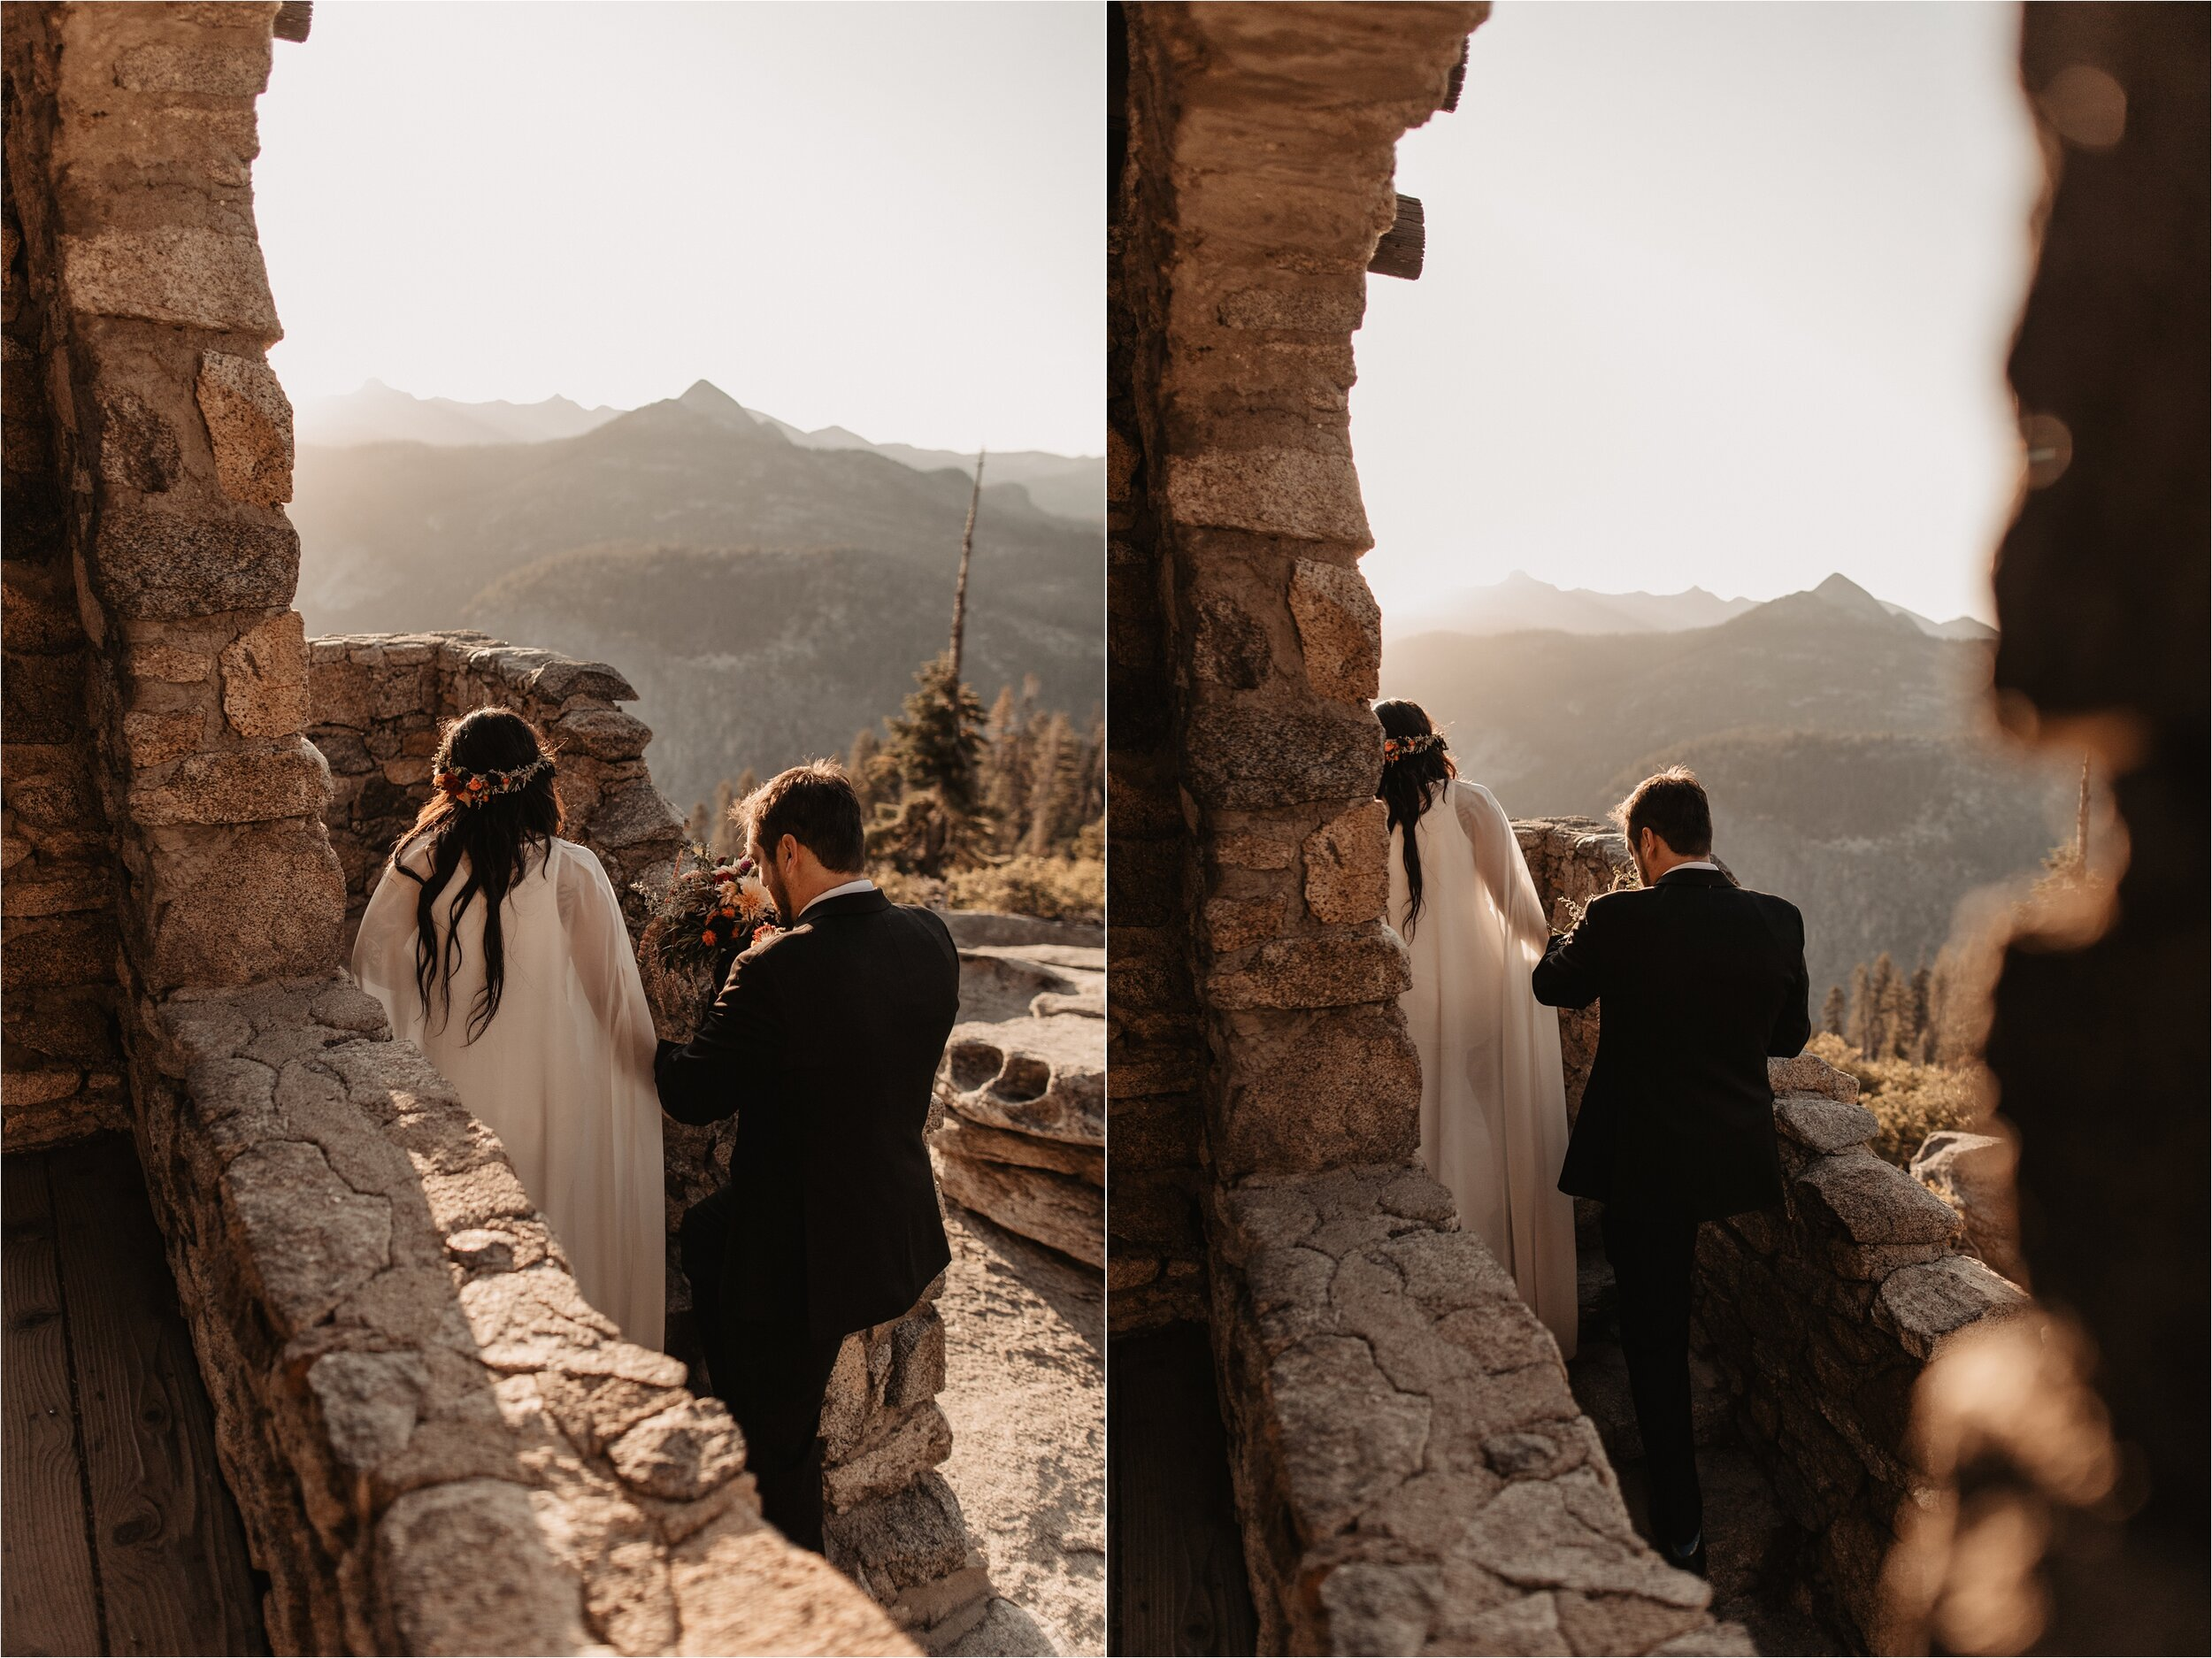 glacier-point-yosemite-elopement-ceremony_0042.jpg